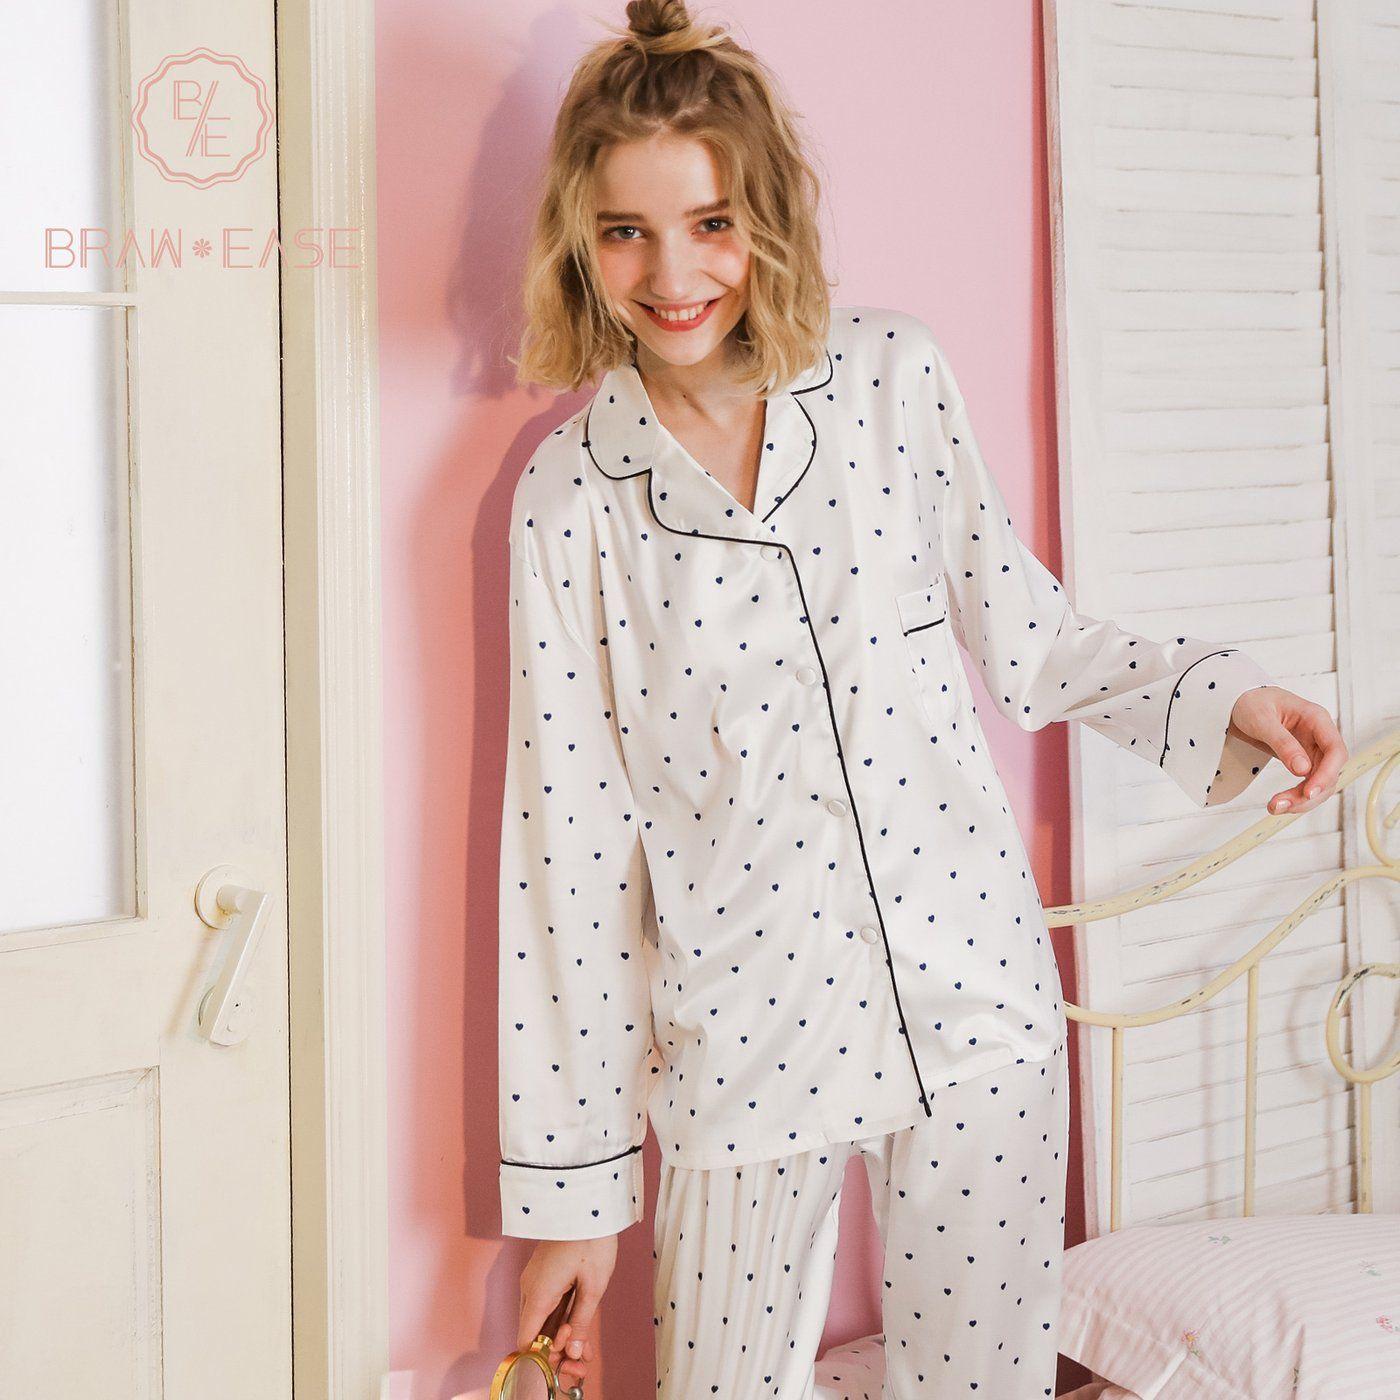 093e97d761a Womens Little Heart Satin Button Up Long Sleeve Pajama Set with Eye ...